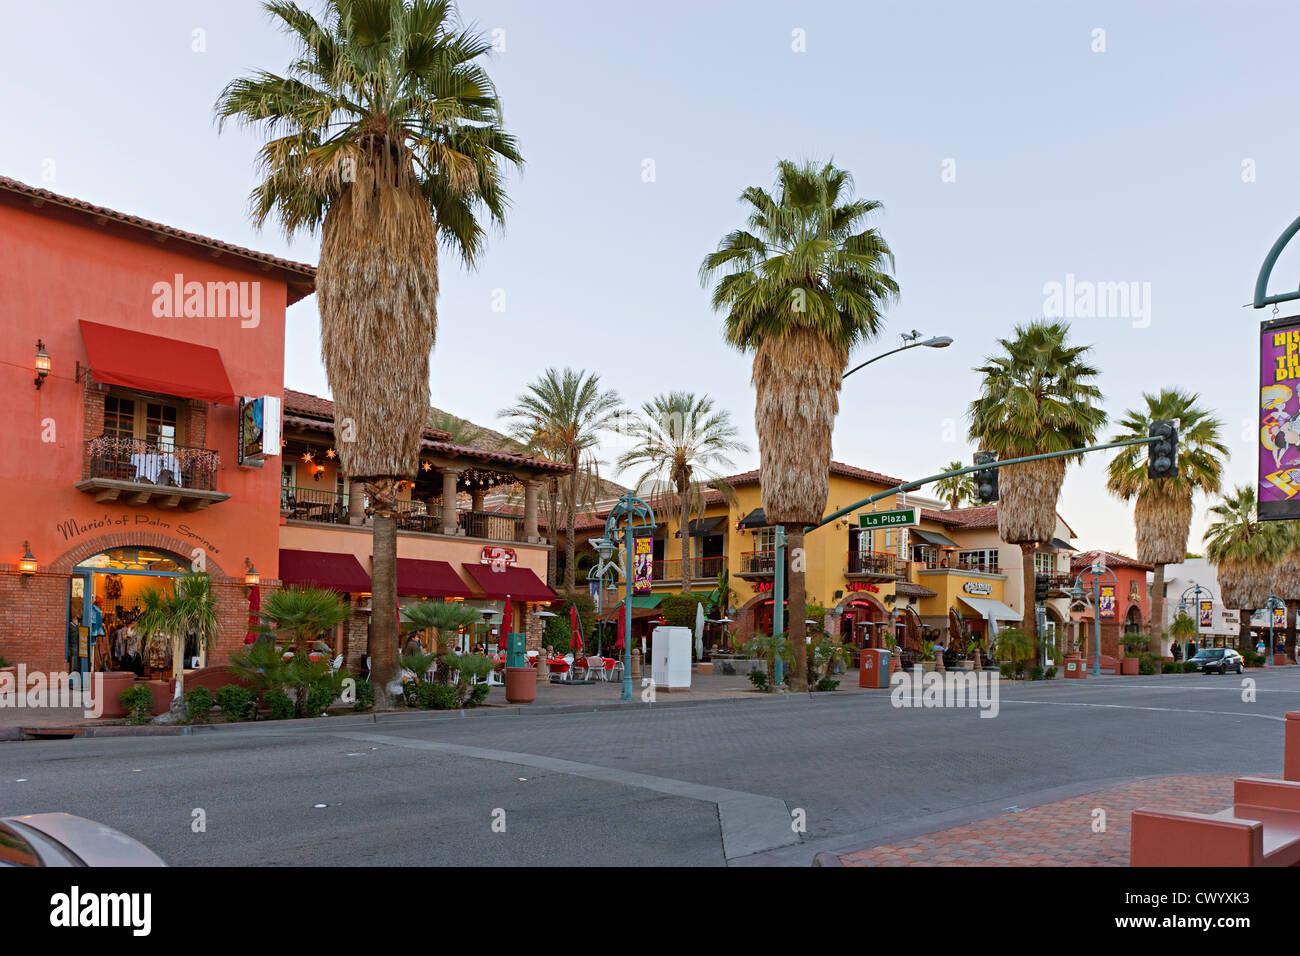 Straßenansicht-Palm Springs-USA Stockbild